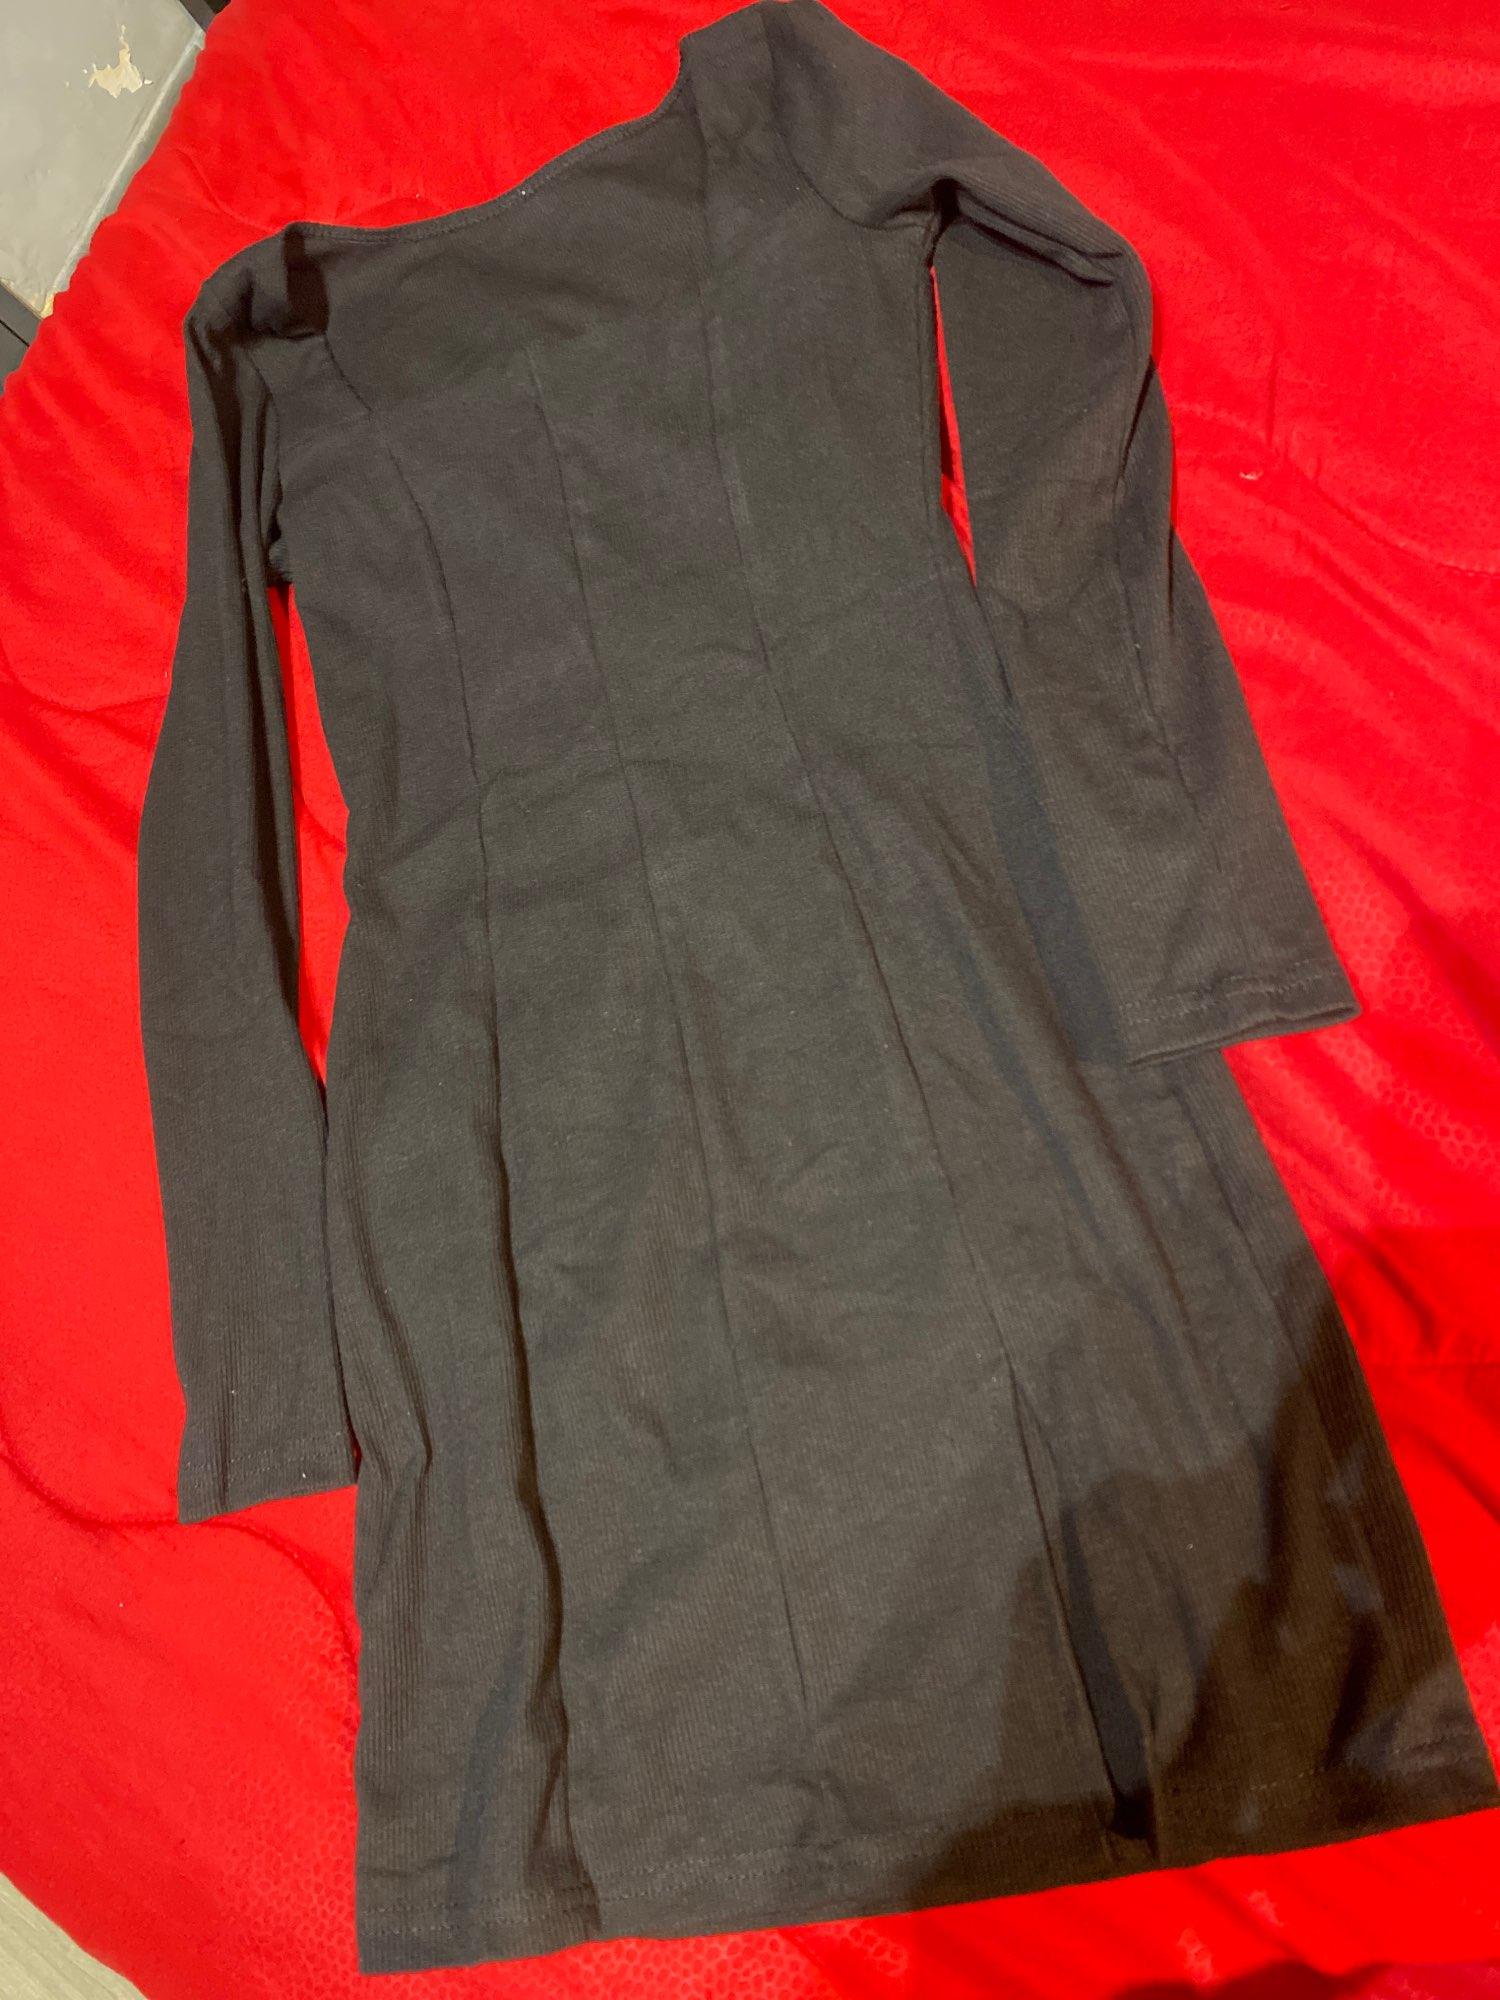 Women Winter Dress Women 2020 New Arrivals Sexy Long Sleeve Square Collar Split Khaki Black Solid Party Dresses Vestidos reviews №1 224898